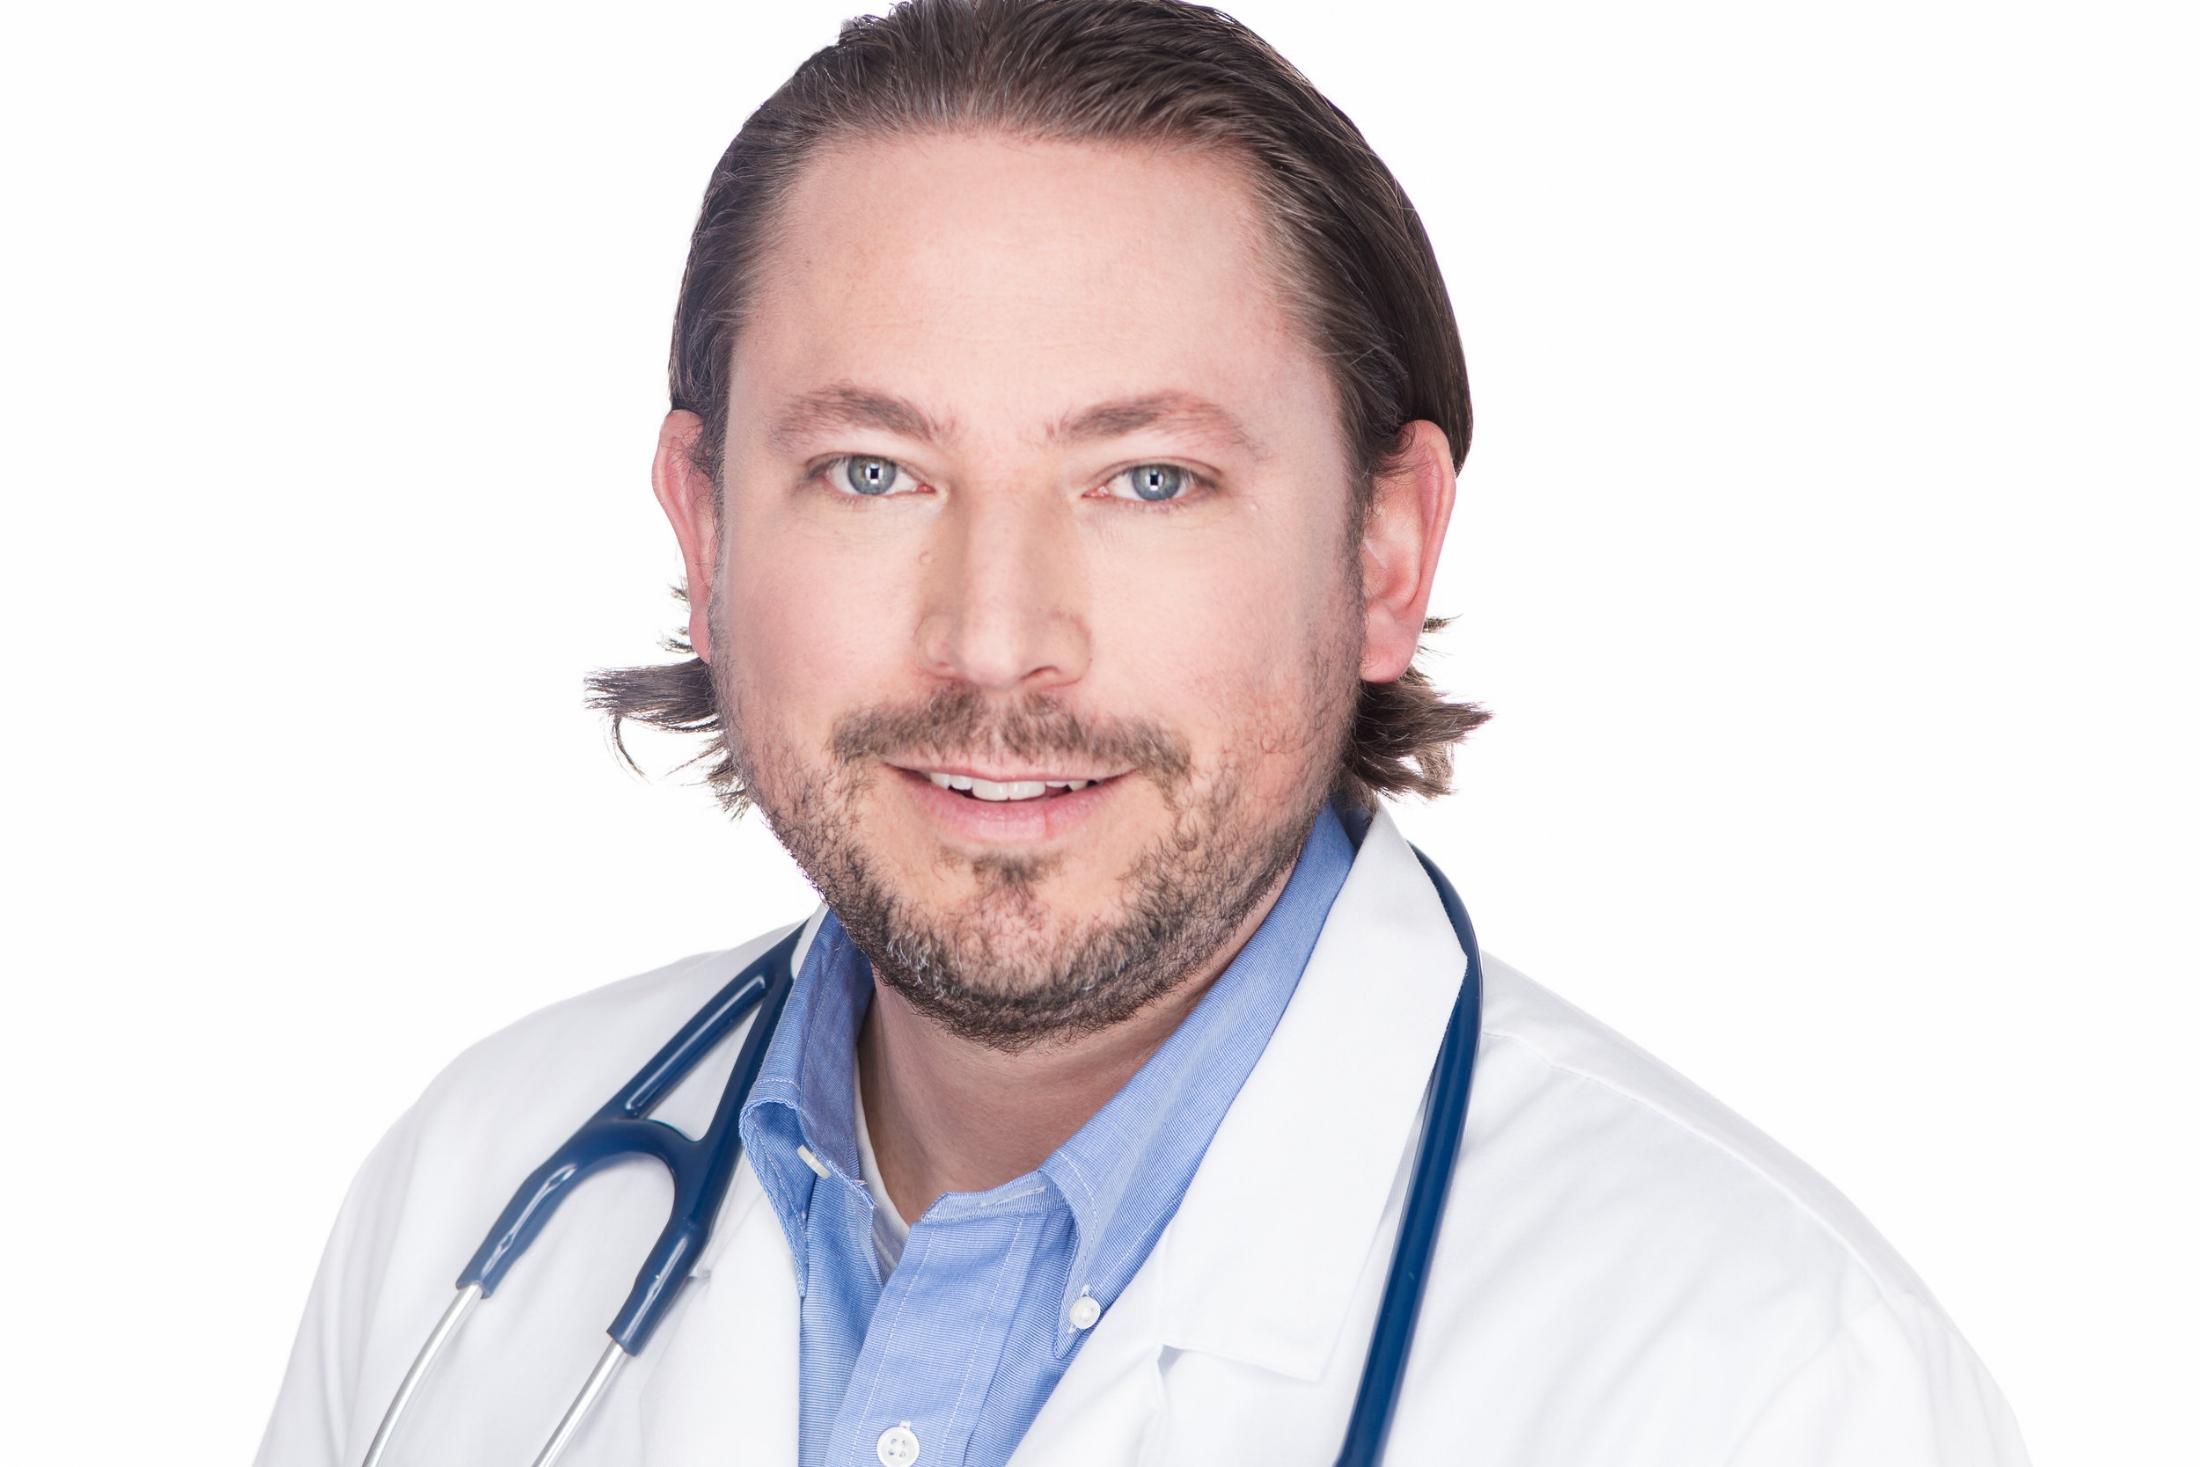 Dr Tim Caraher-20180124-0017-PRINT300DPI-2.jpg